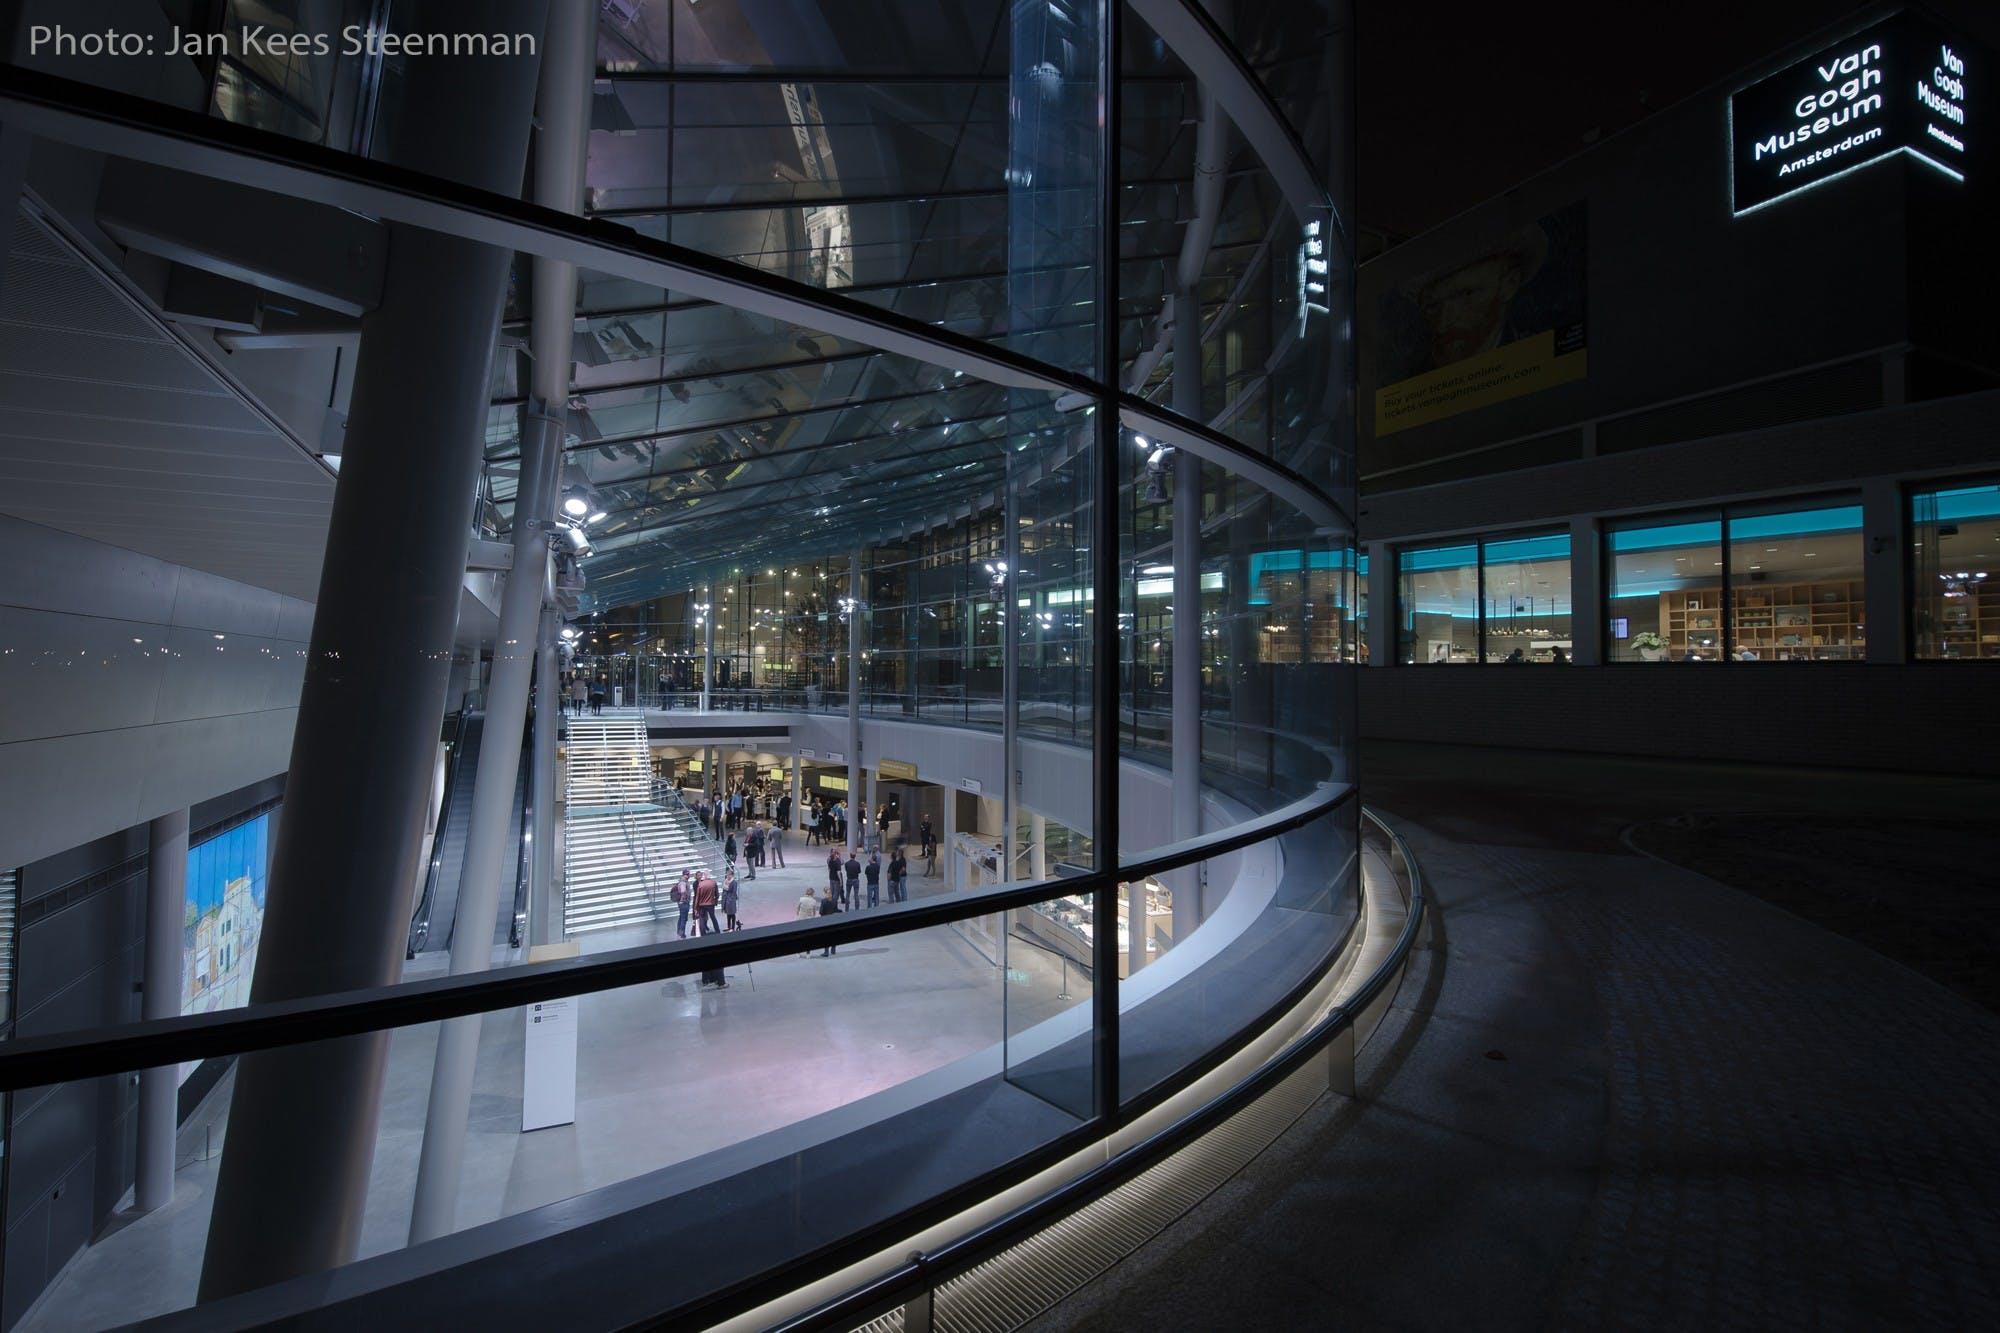 Van Gogh with photo credits museum entrance at night